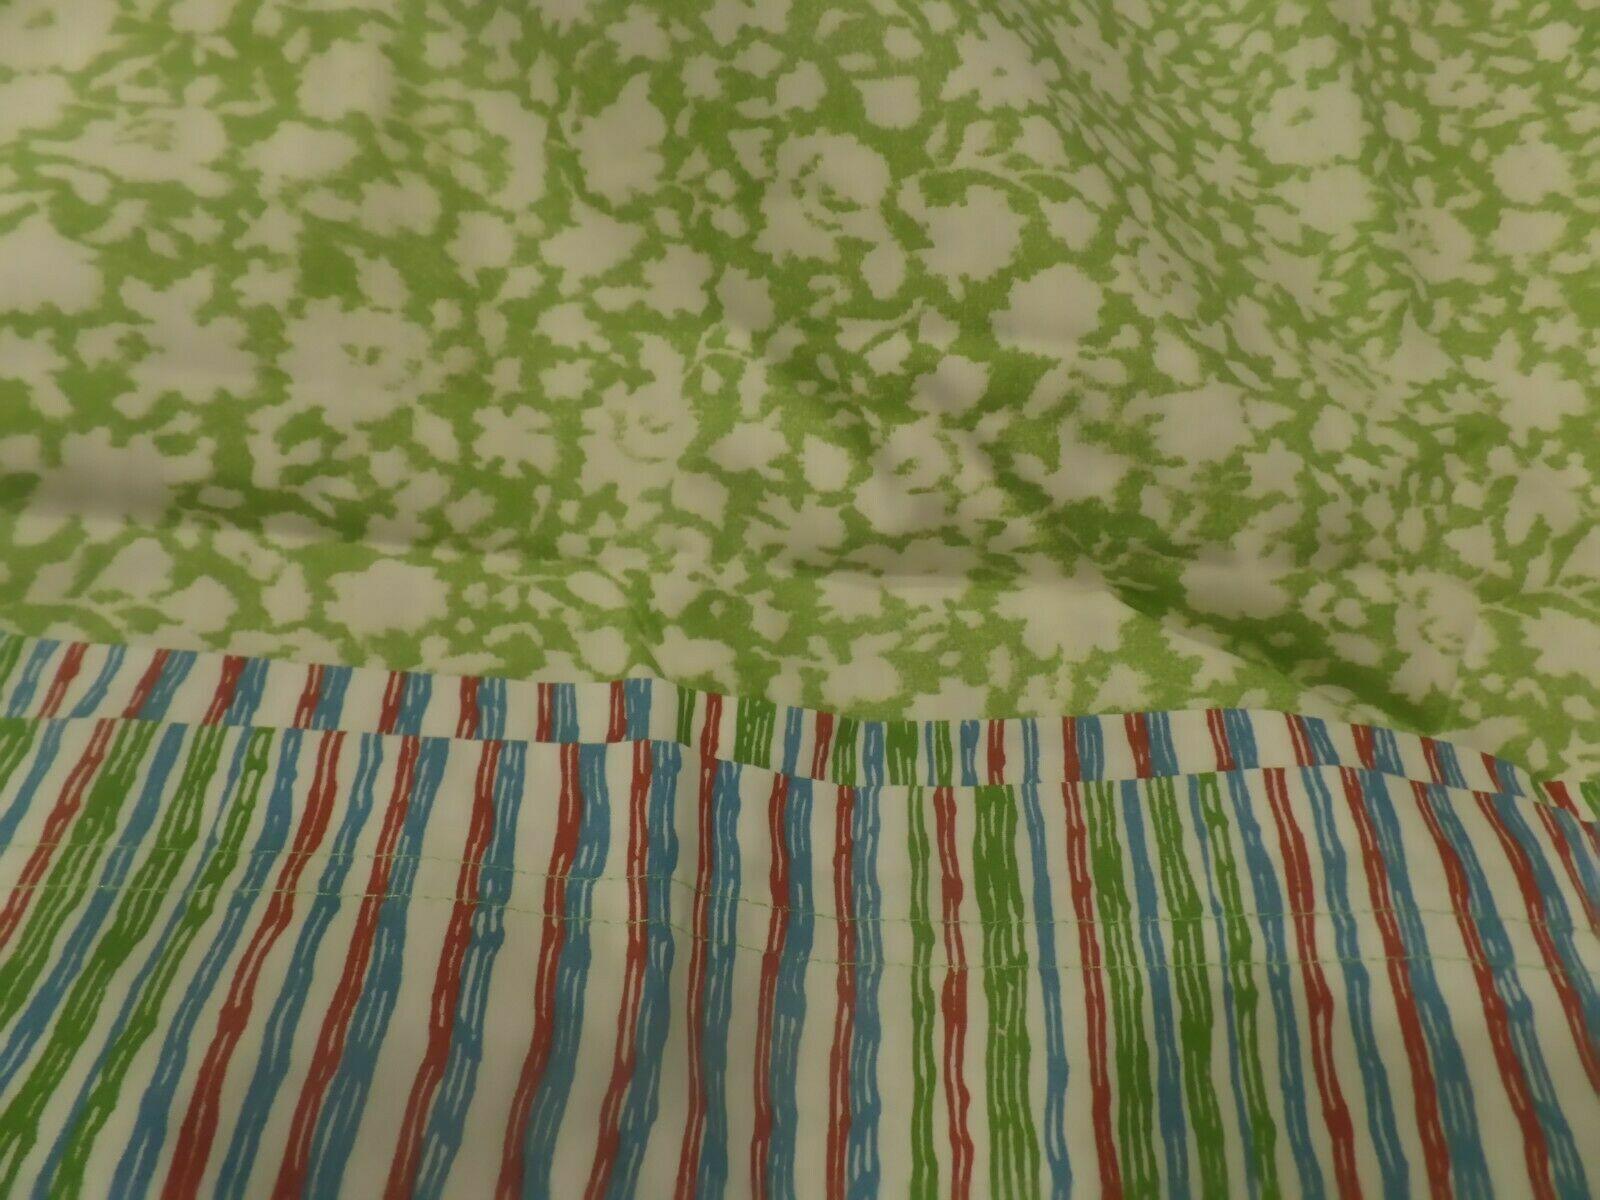 Ralph Lauren Gemma Stripe 3pc Cotton King Duvet Set 2 shams verde blu Ret.  350